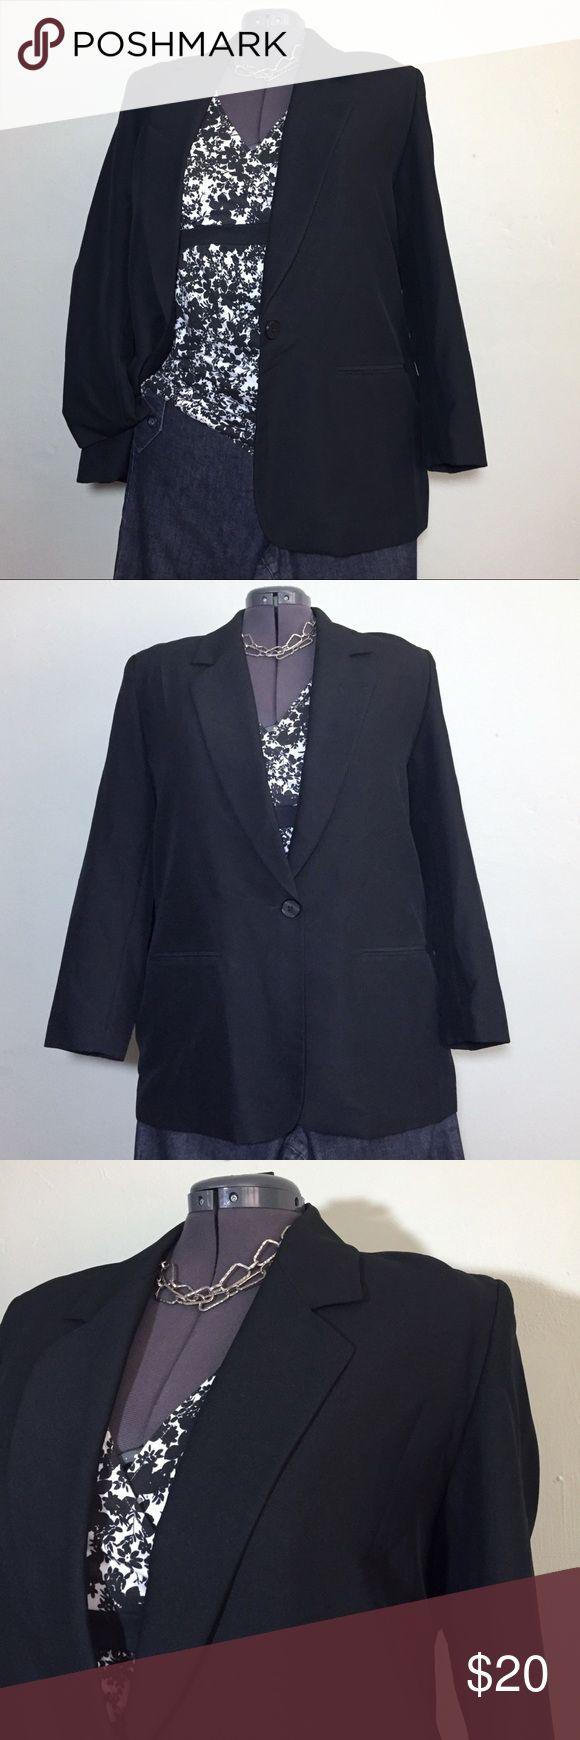 "Liz Baler Essentials Black Blazer Plus Size 20 Liz Baler Essentials Black Blazer. Plus Size 20 measures flat: 18"" across shoulders, 25"" across chest, 31"" long, 24"" sleeve. 100% poly and fully lined. 1018/100/102917 Liz Baker Essentials Jackets & Coats Blazers"